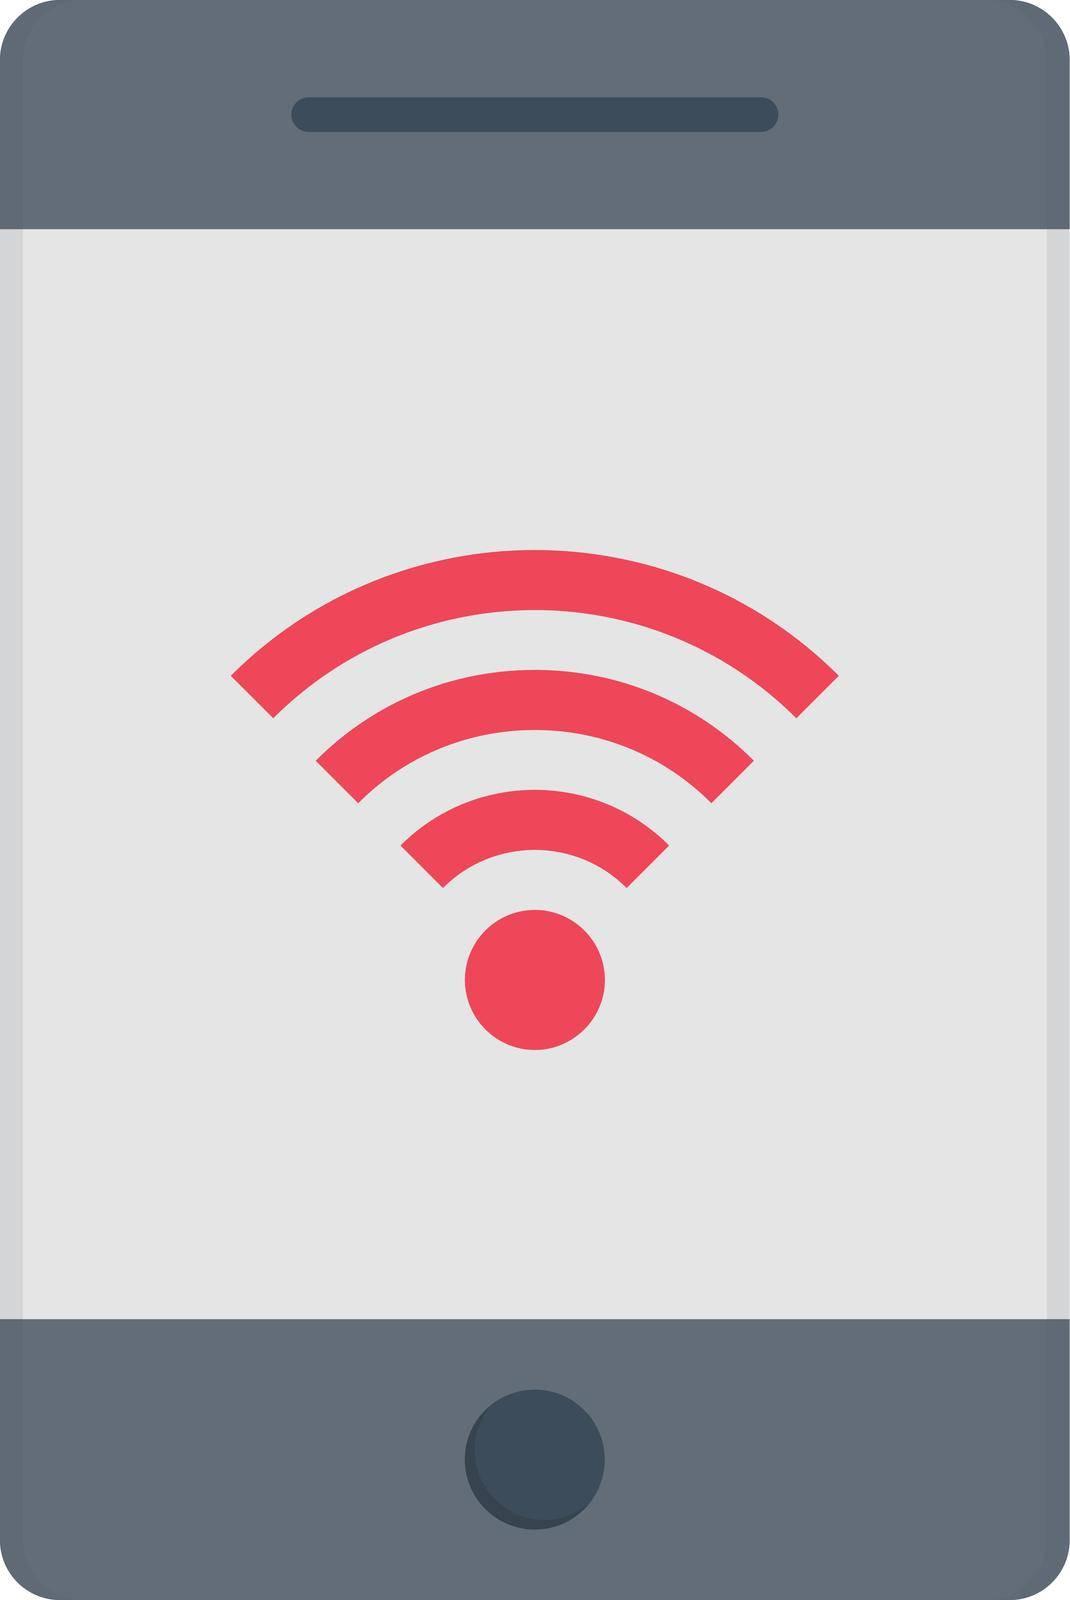 internet vector flat color icon